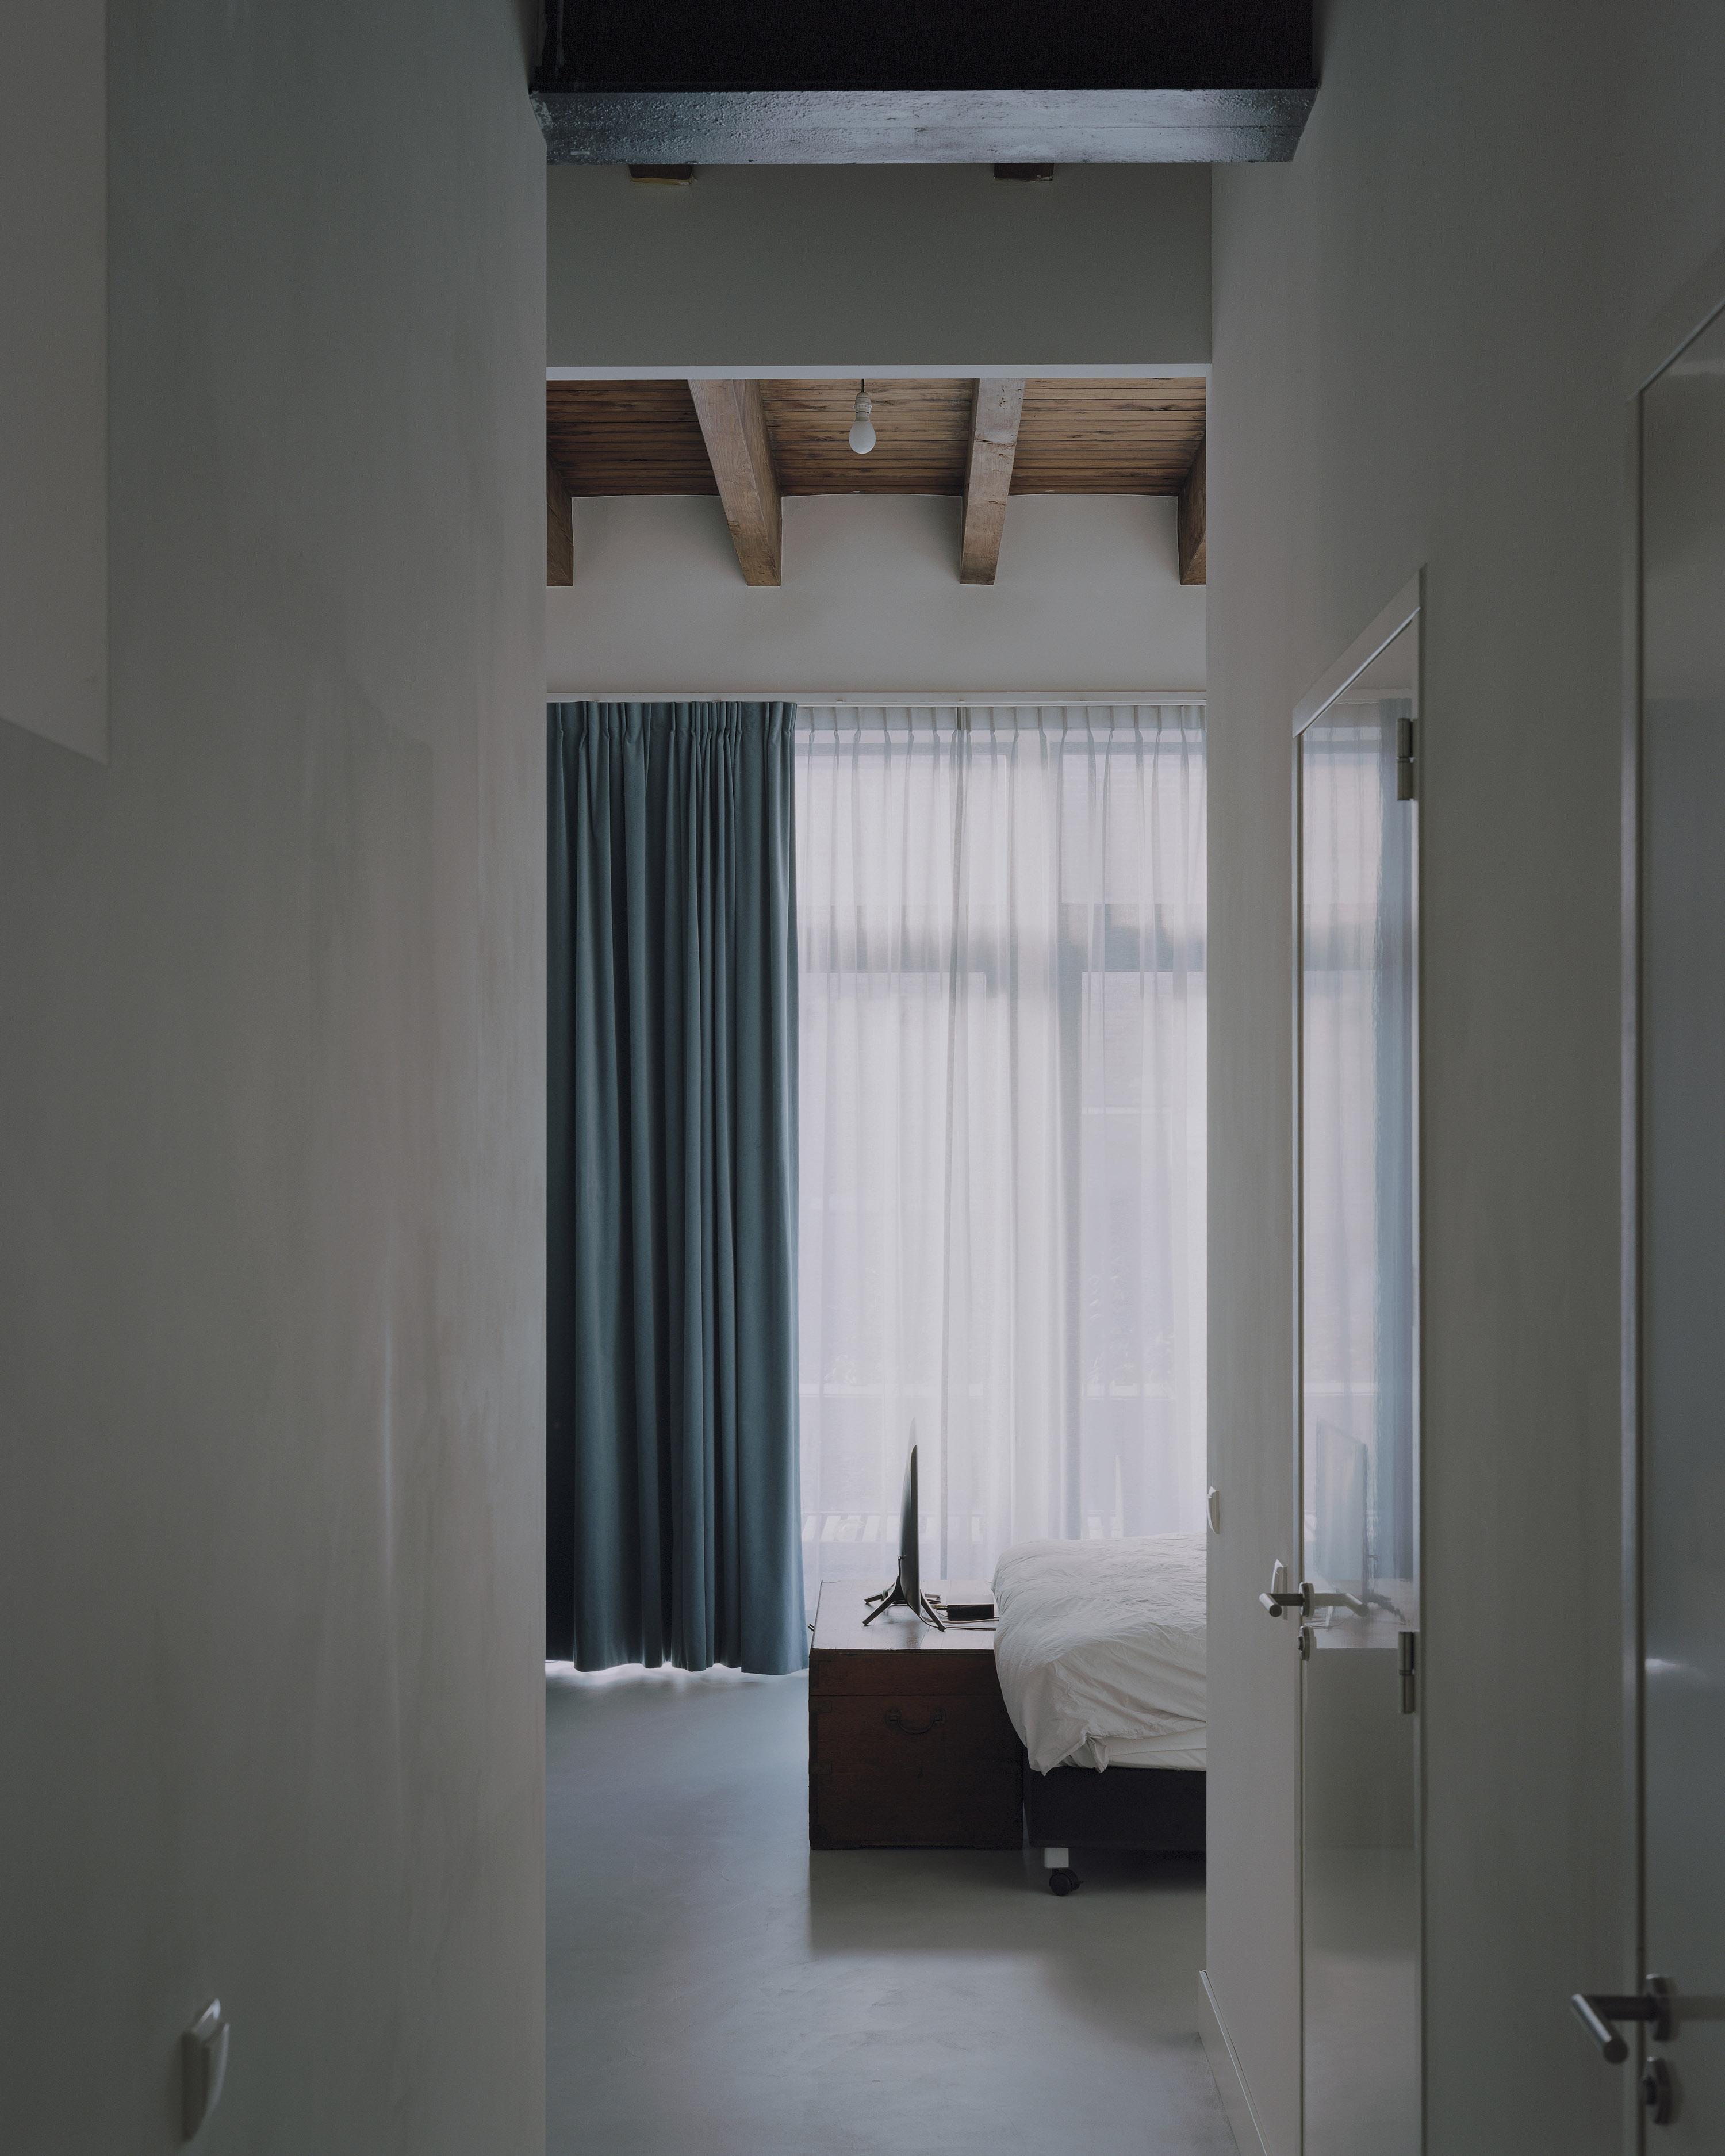 <p>slaapkamer op begane grond, foto: Kim Zwarts</p>